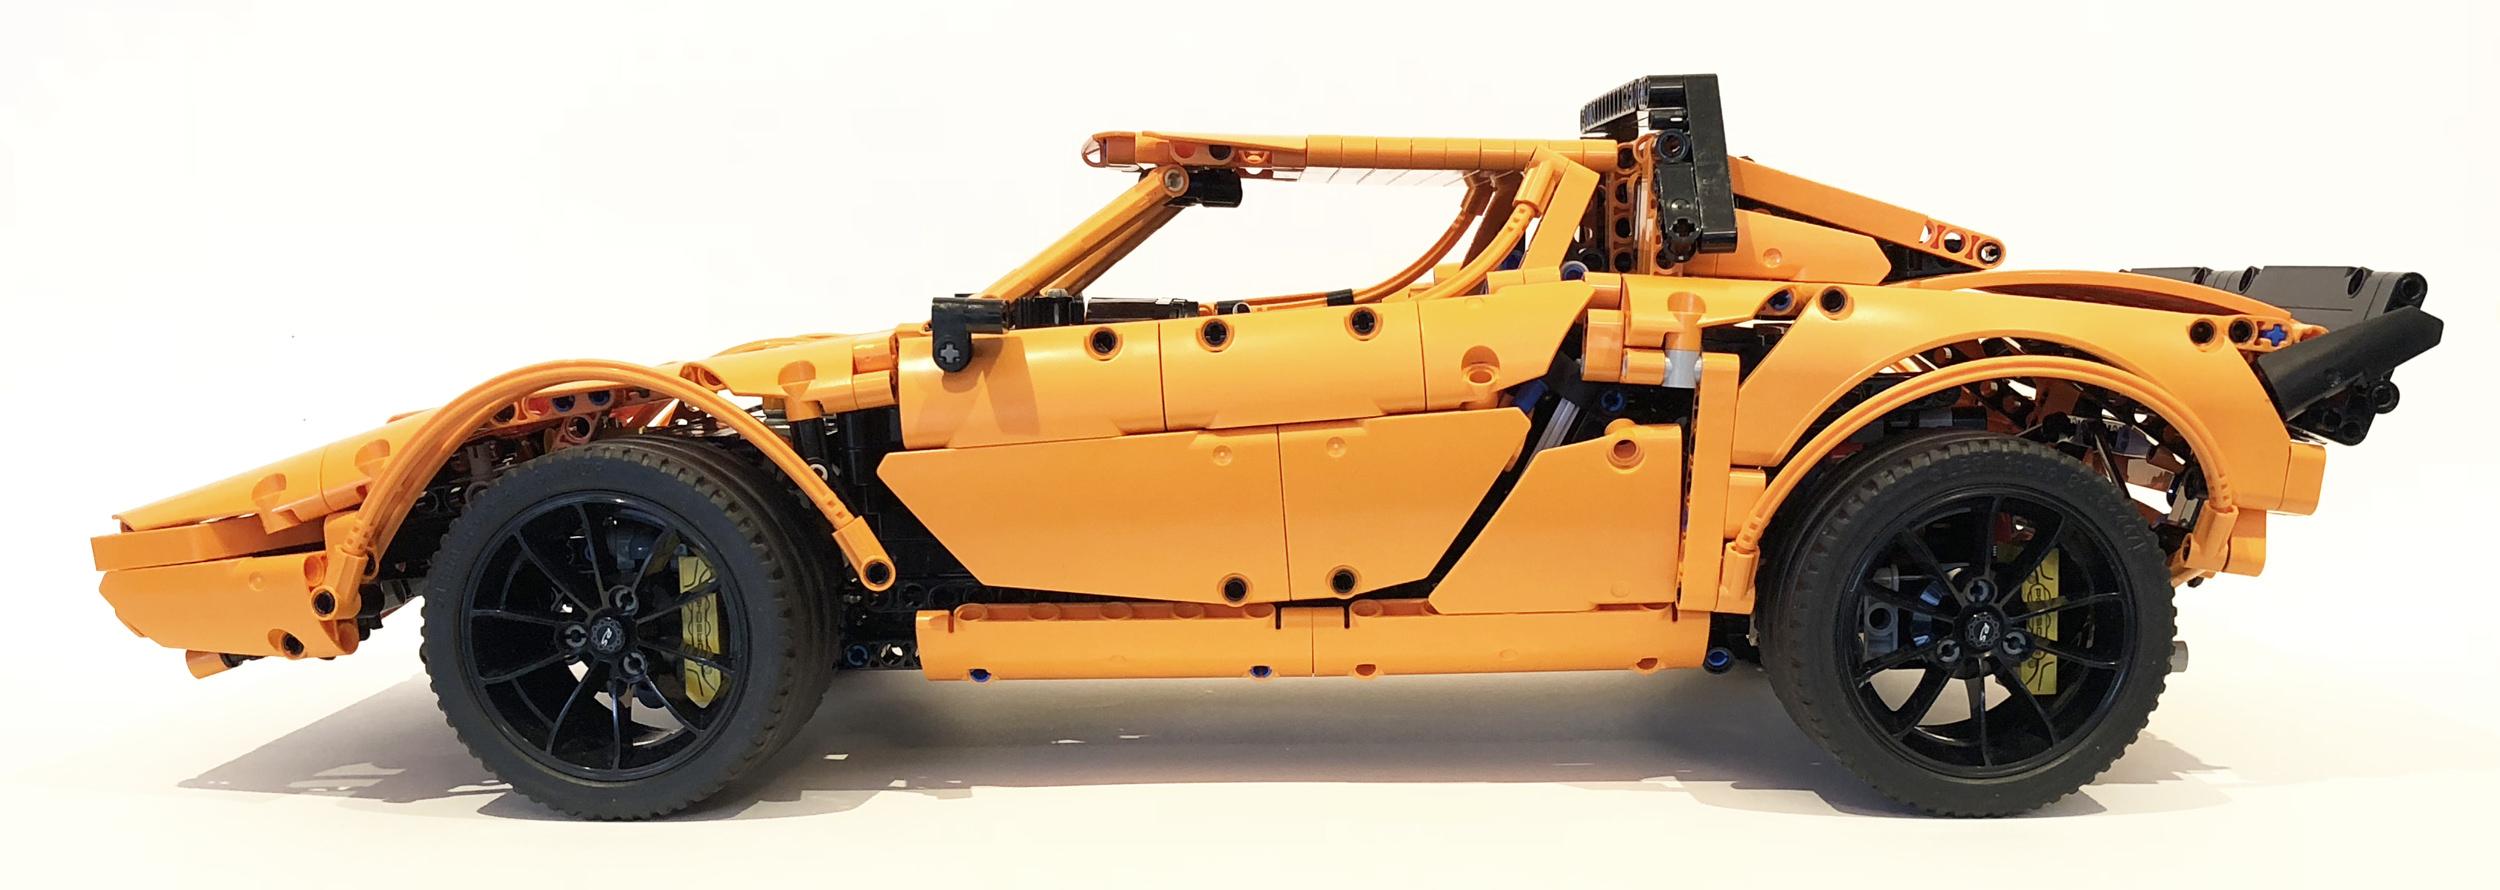 Lego Technic Lancia Stratos Porsche GT3 RS kit (5)